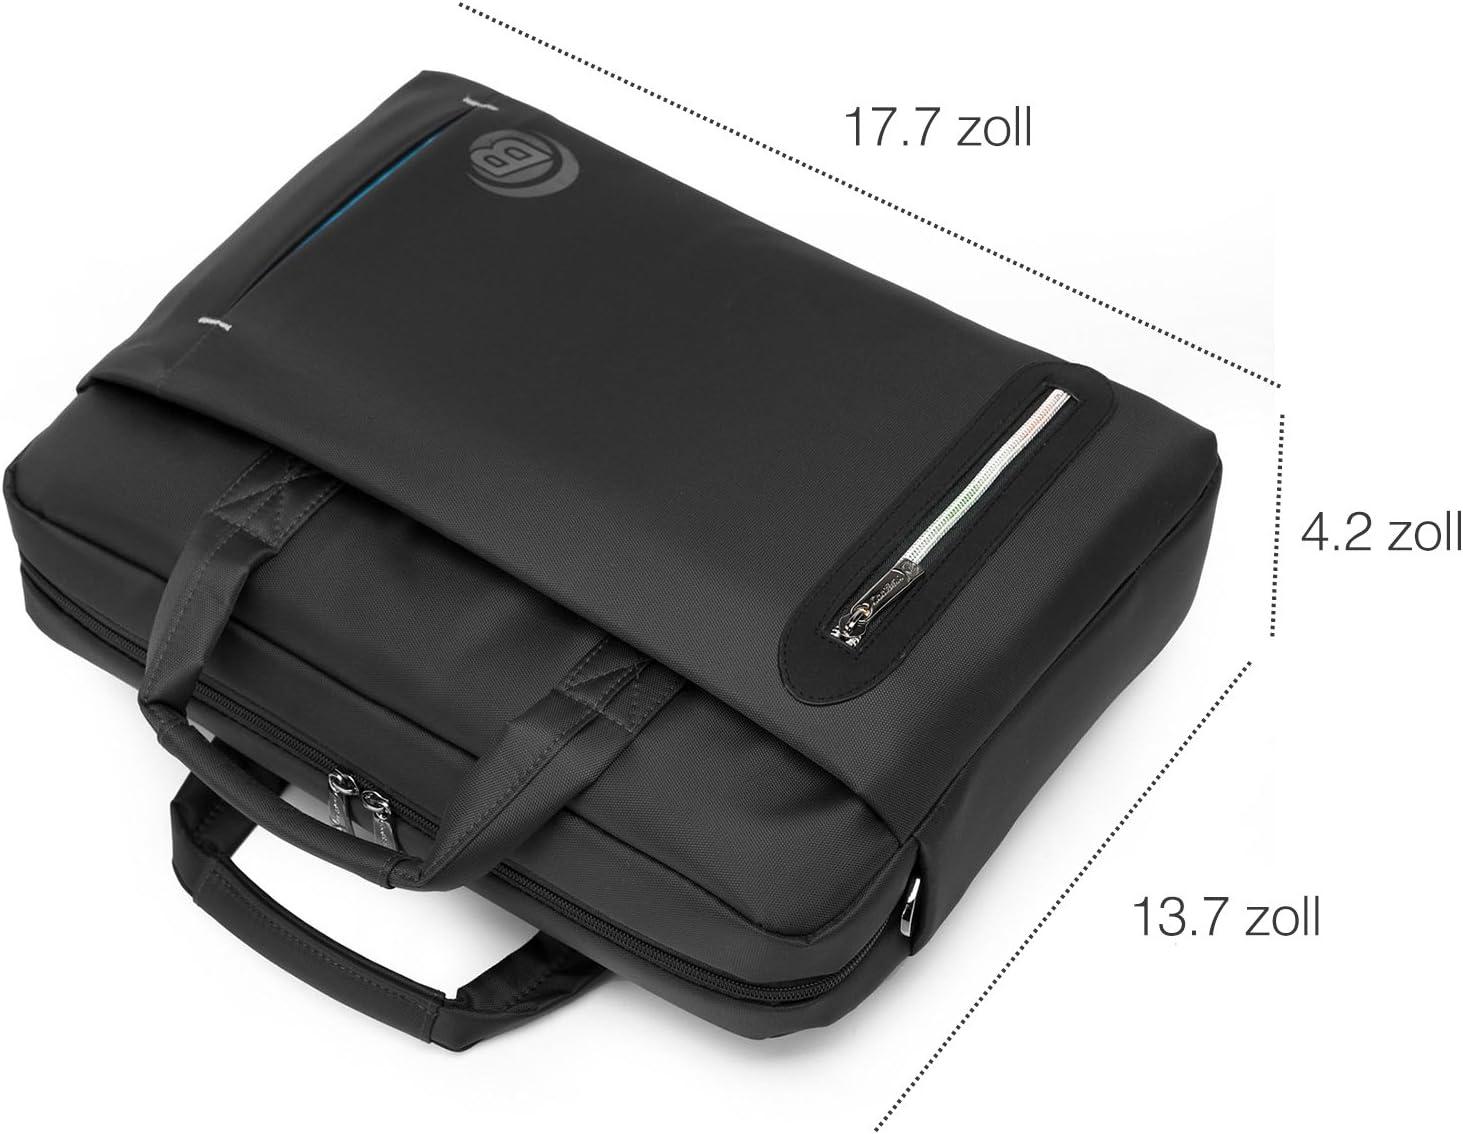 Srotek 15,6 Zoll Laptoptasche Schultertaschen Wasserdicht Notebooktasche Business Aktentasche Umh/ängetasche f/ür Laptop /& Notebook Herren Damen,Grau